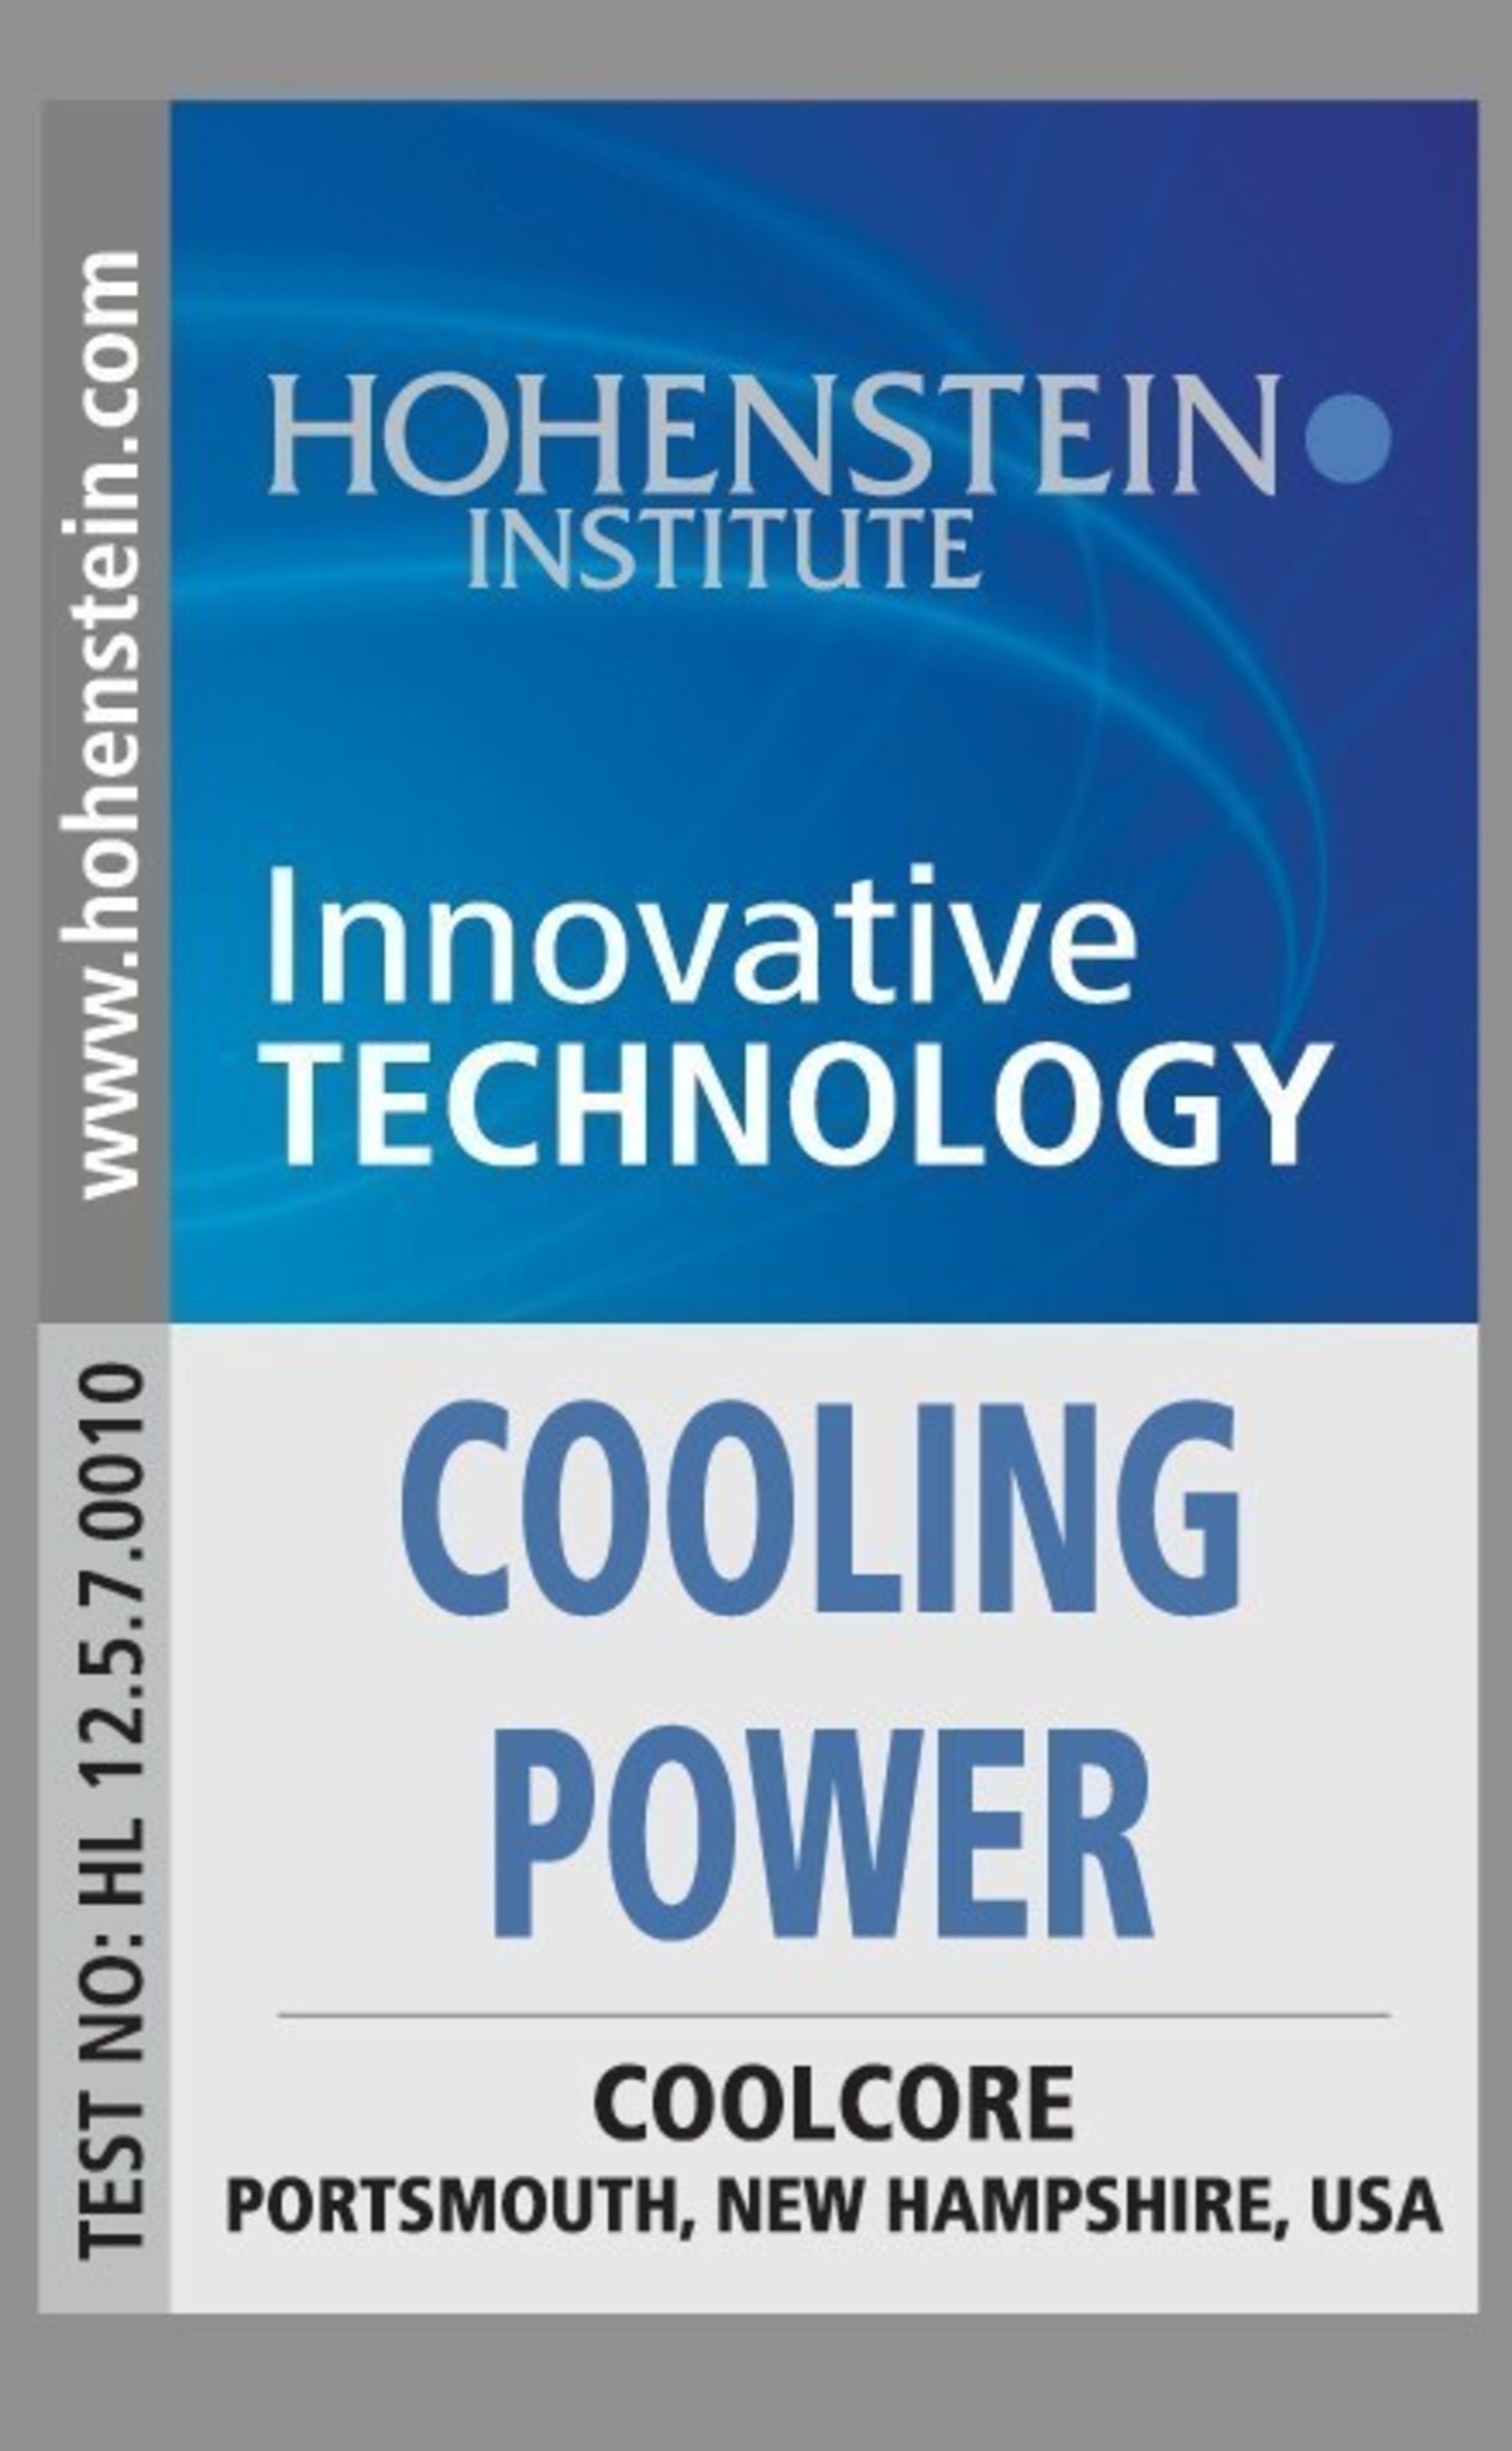 Coolcore LLC Finalizes Purchase of Tempnology Assets